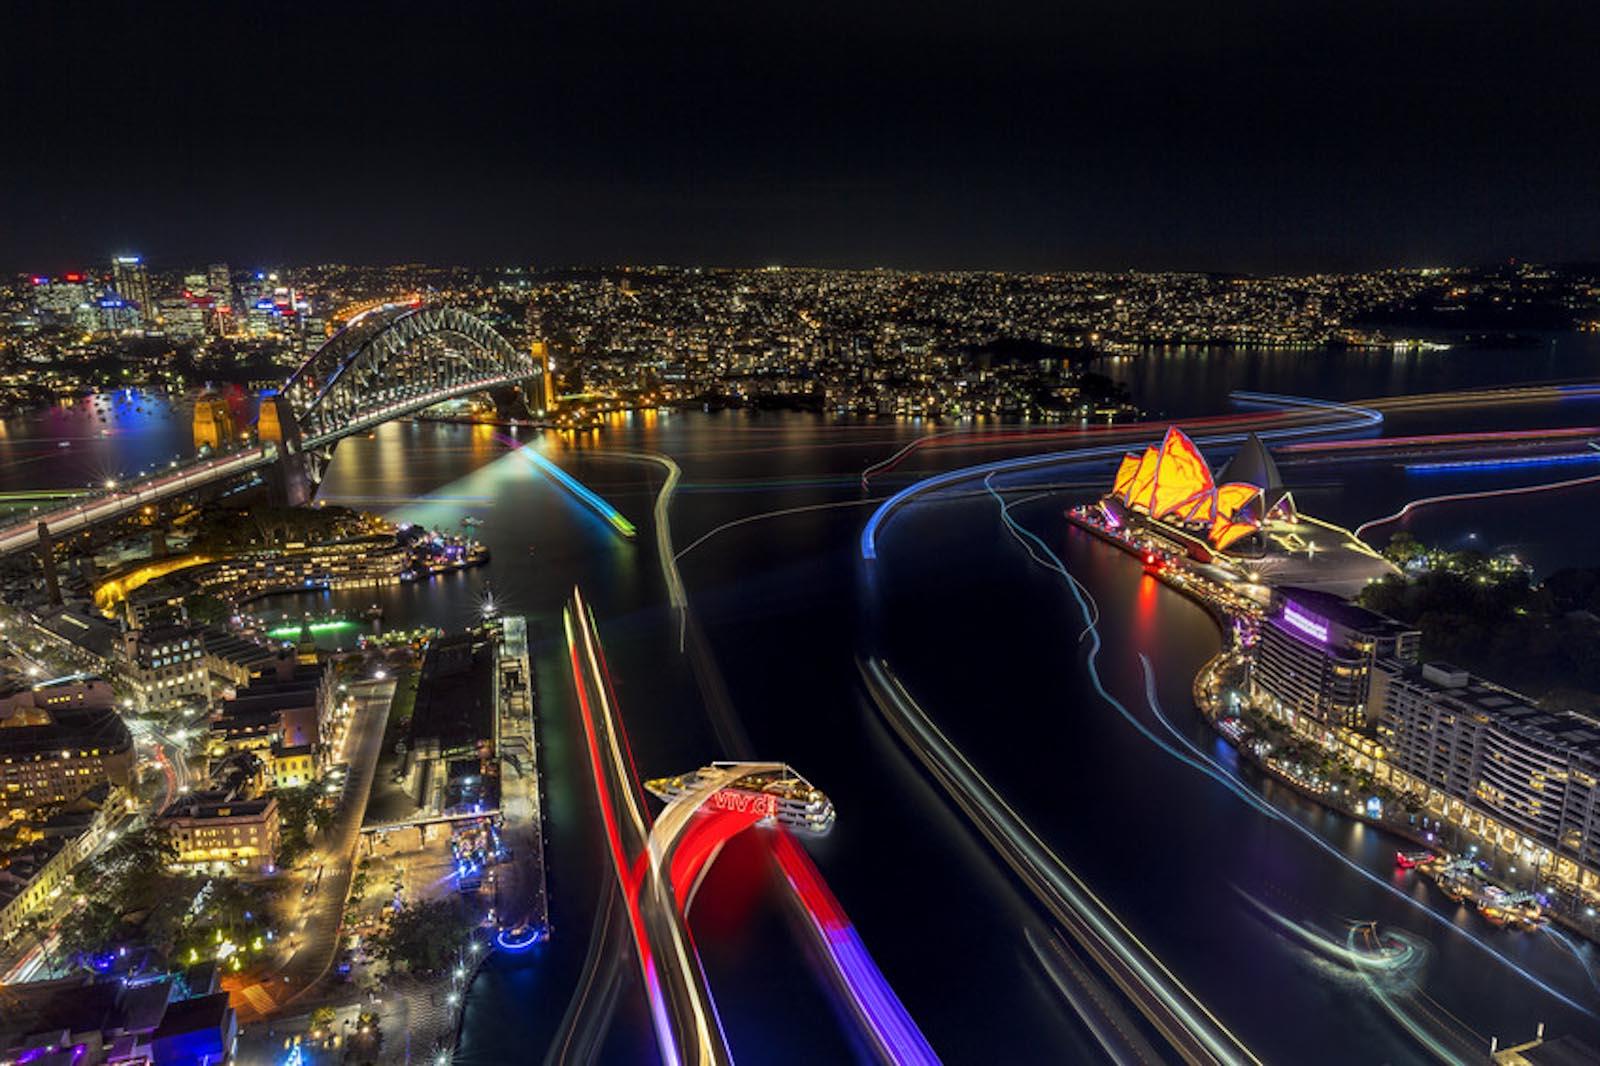 Vivid Sydney, salah satu acara yang menarik selain kembang api tahun baru